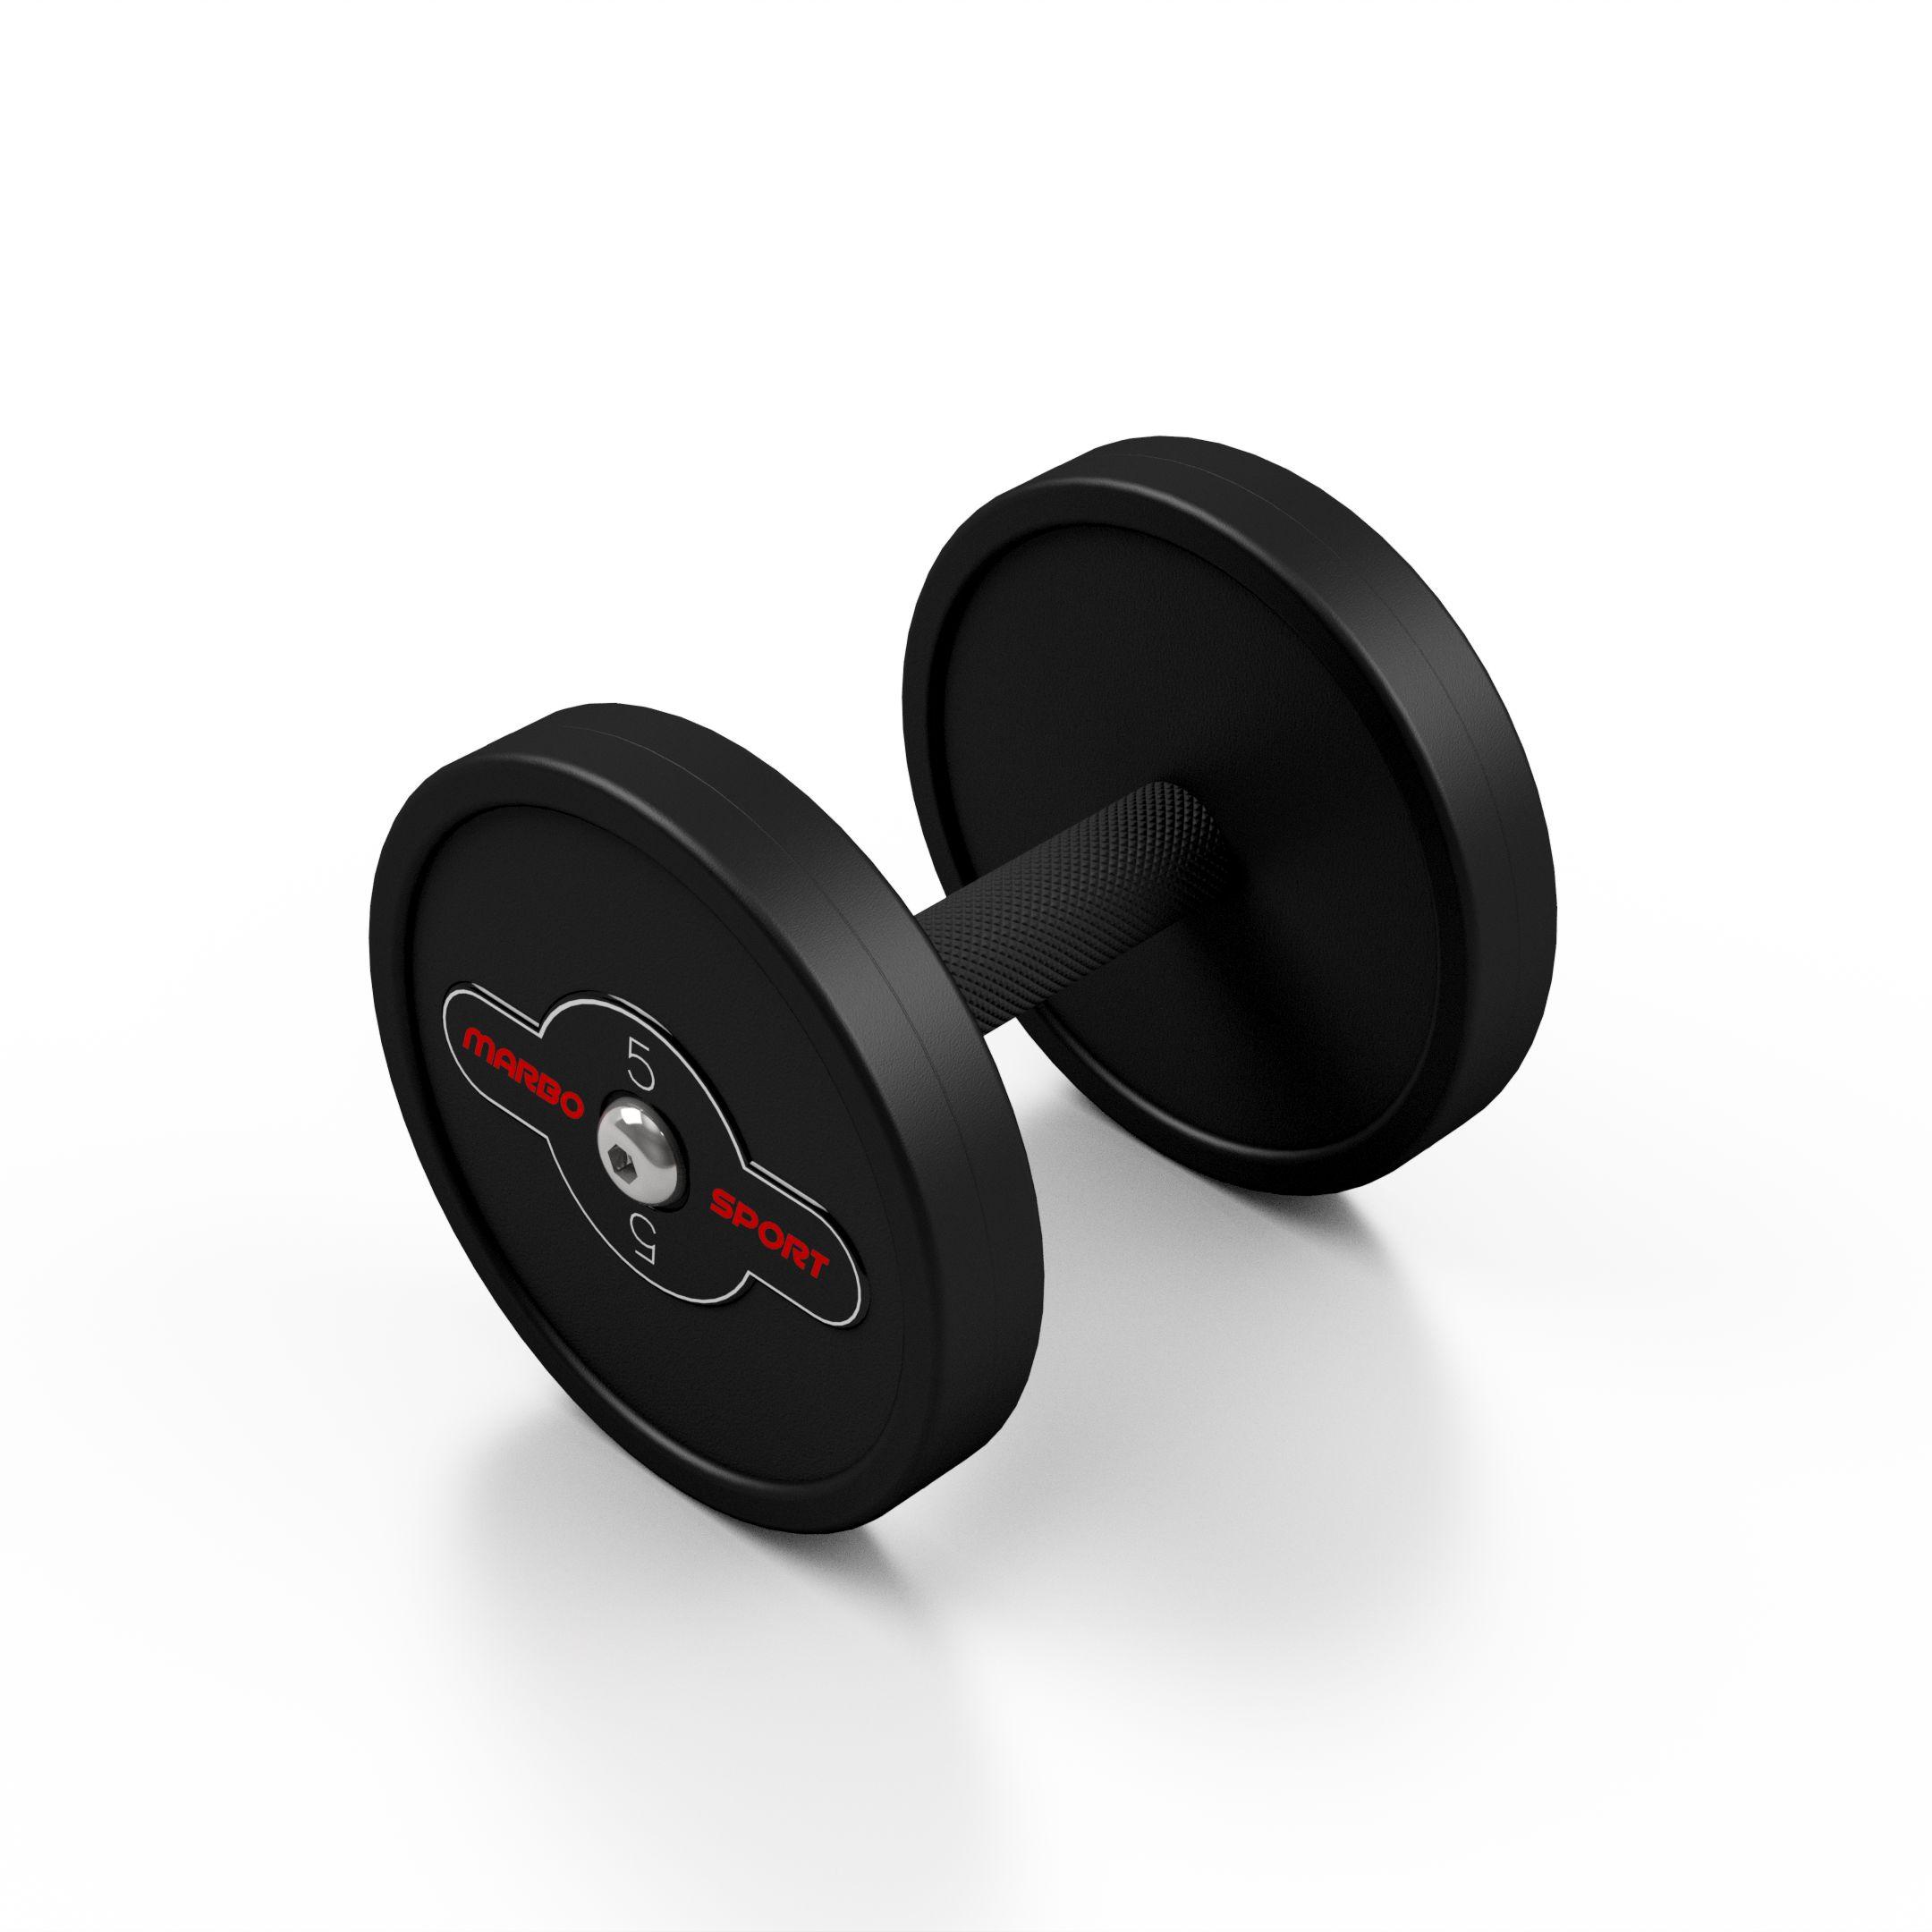 Hantla stalowa gumowana 5 kg czarny mat - Marbo Sport - 5 kg